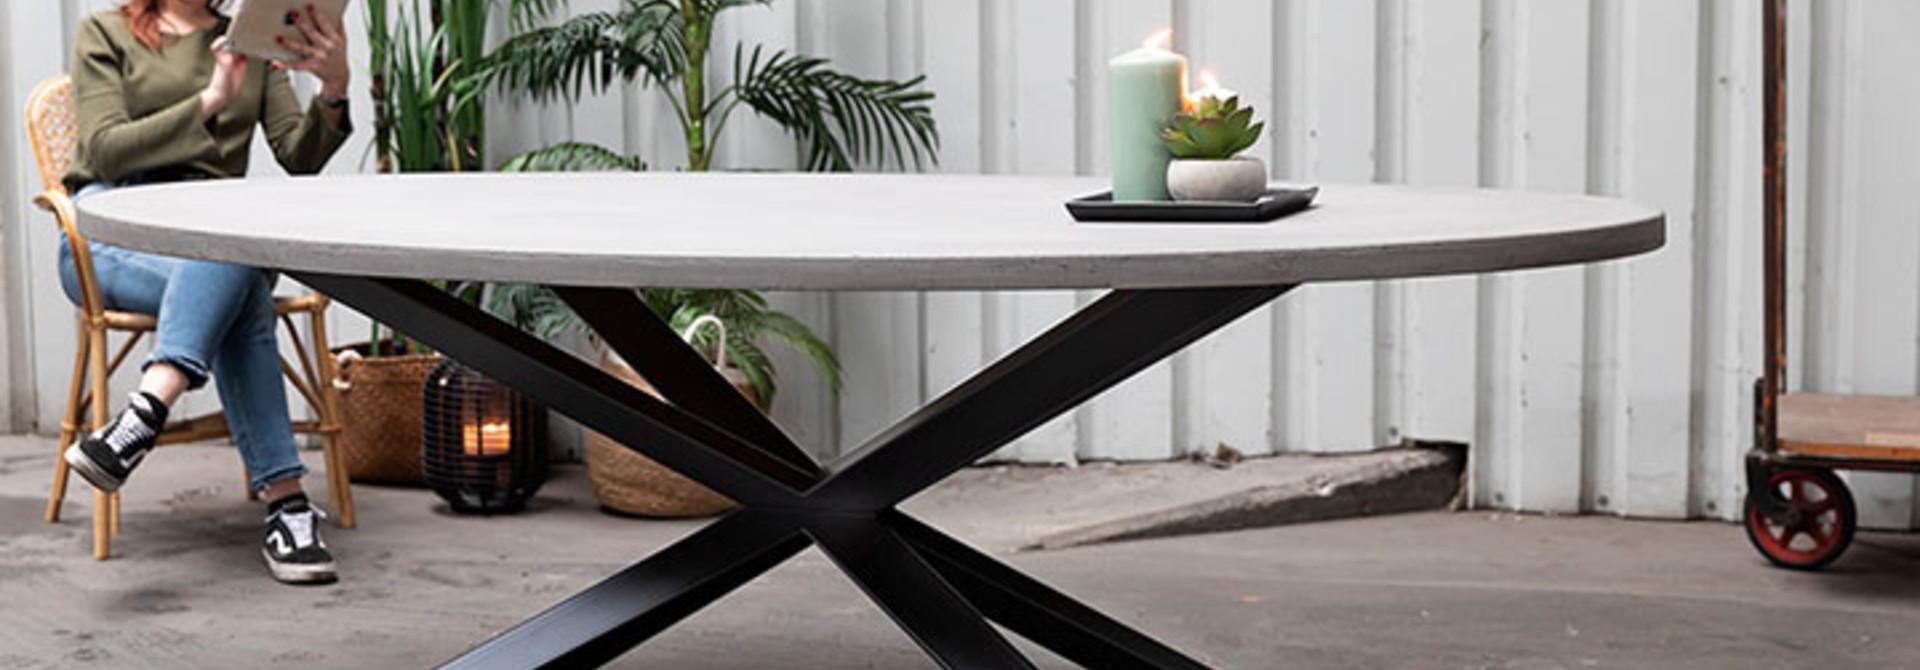 Tafelonderstellen ovale tafels